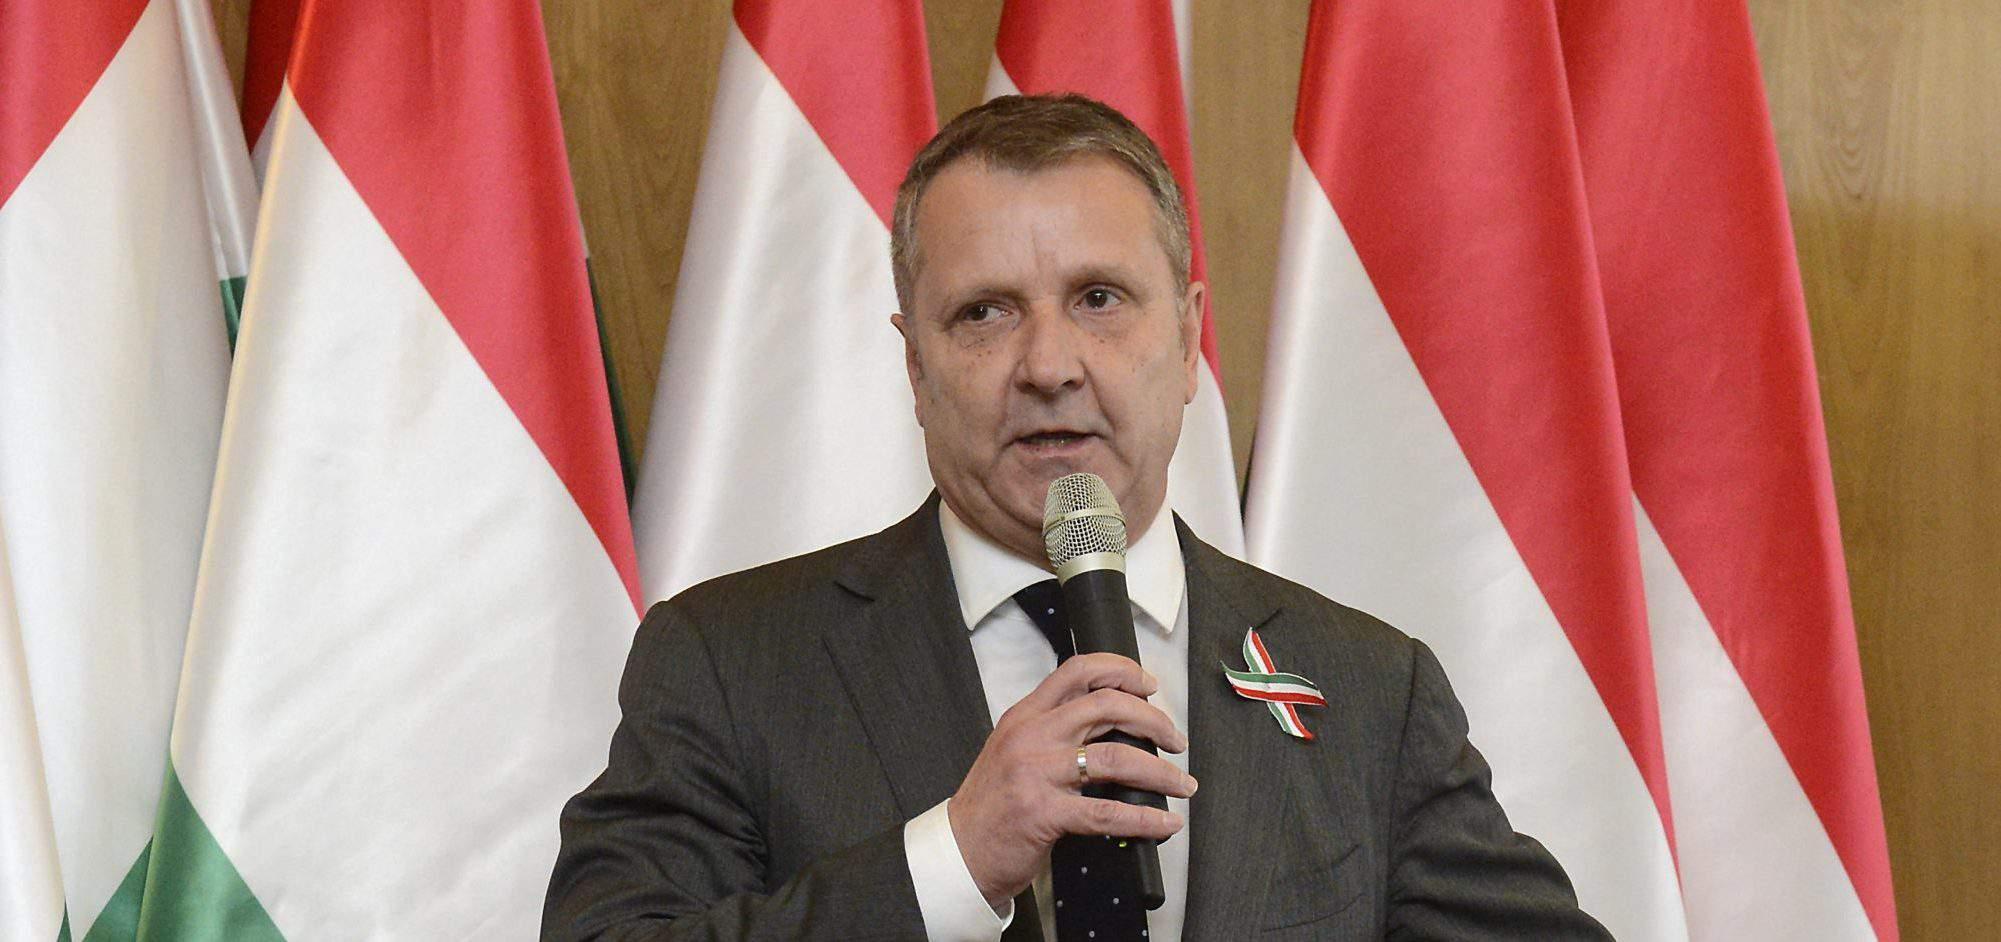 socialists Hungary mszp party Molnár Gyula